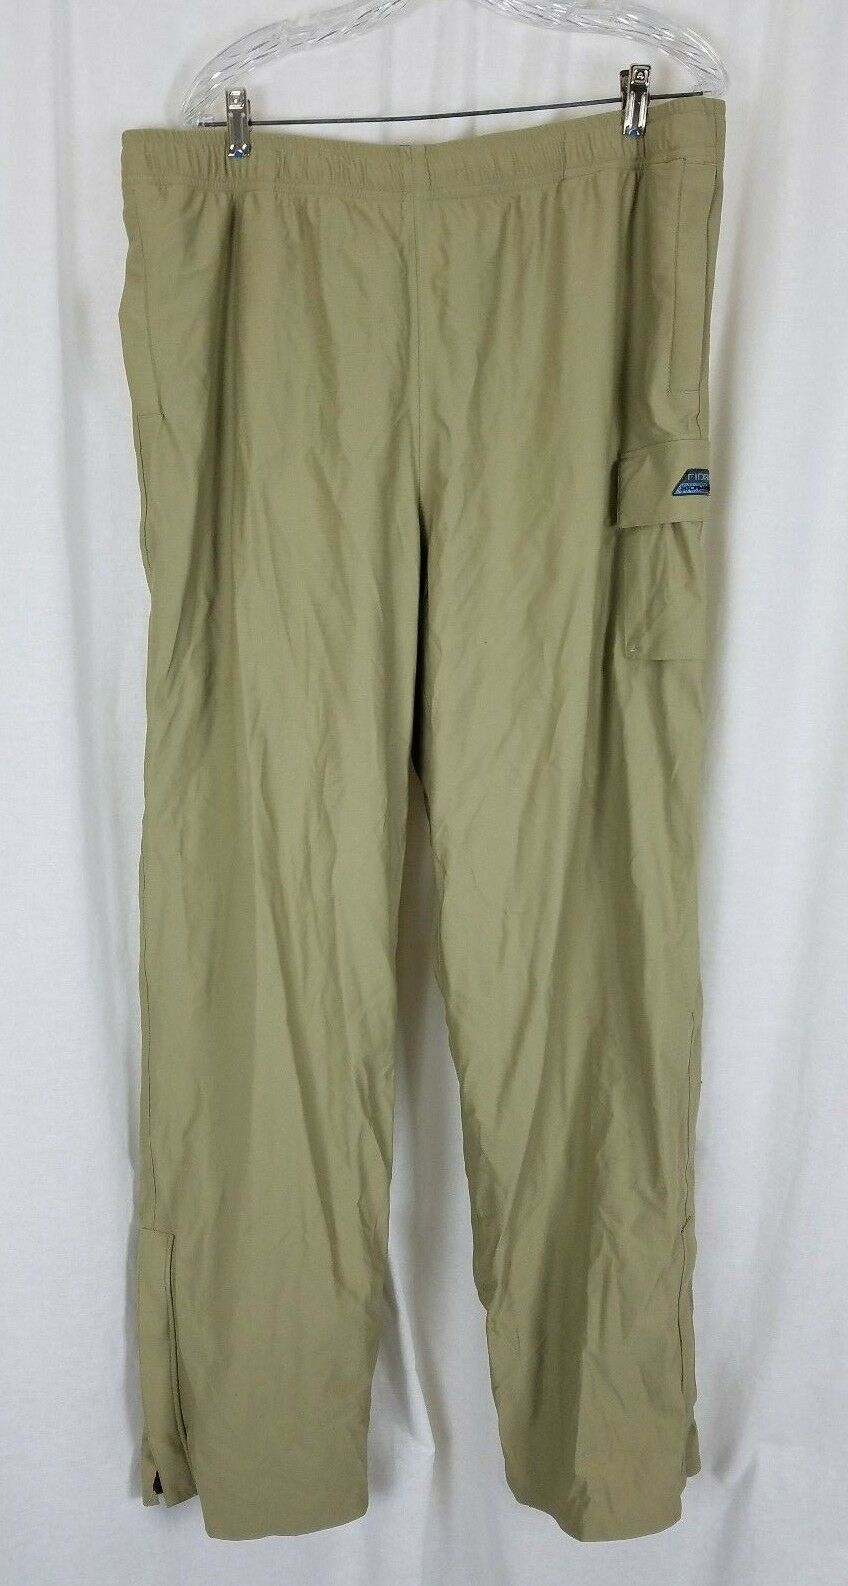 Fidra Storm Proof Mesh Lined Khaki Cargo Pants Mens XL 36 x 33 Tan John Ashworth